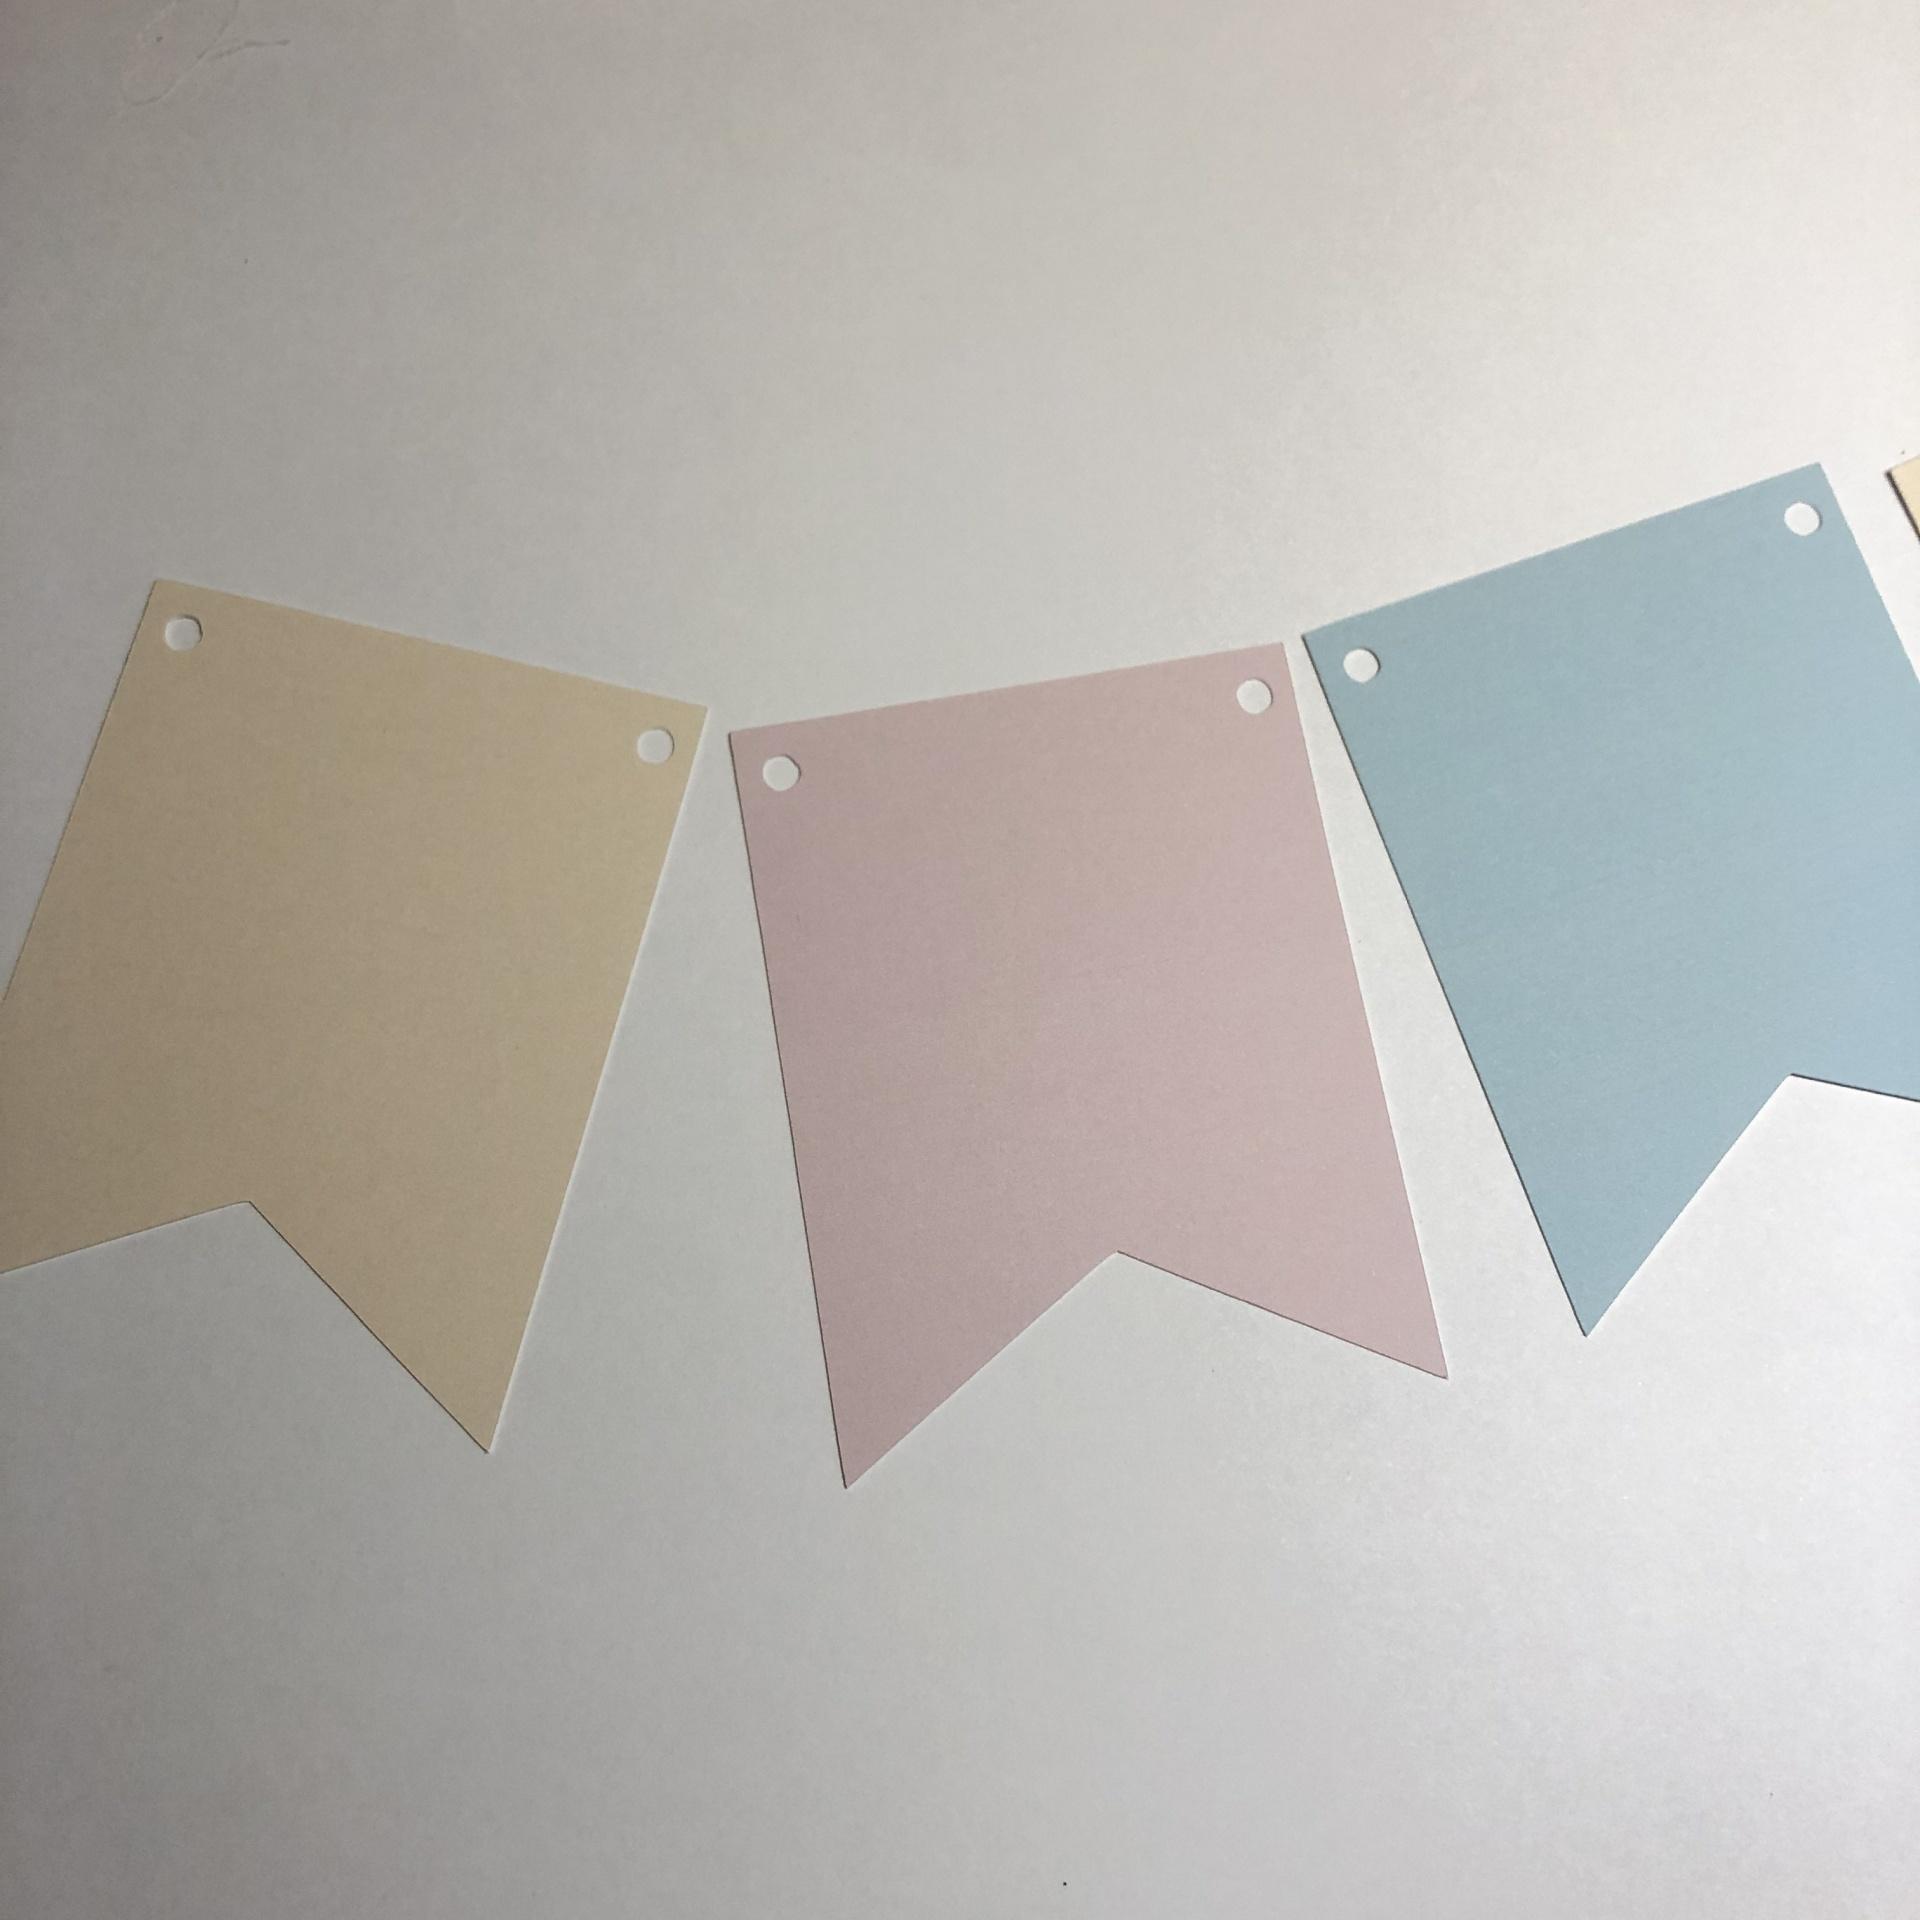 Bandeirola em tons pastel